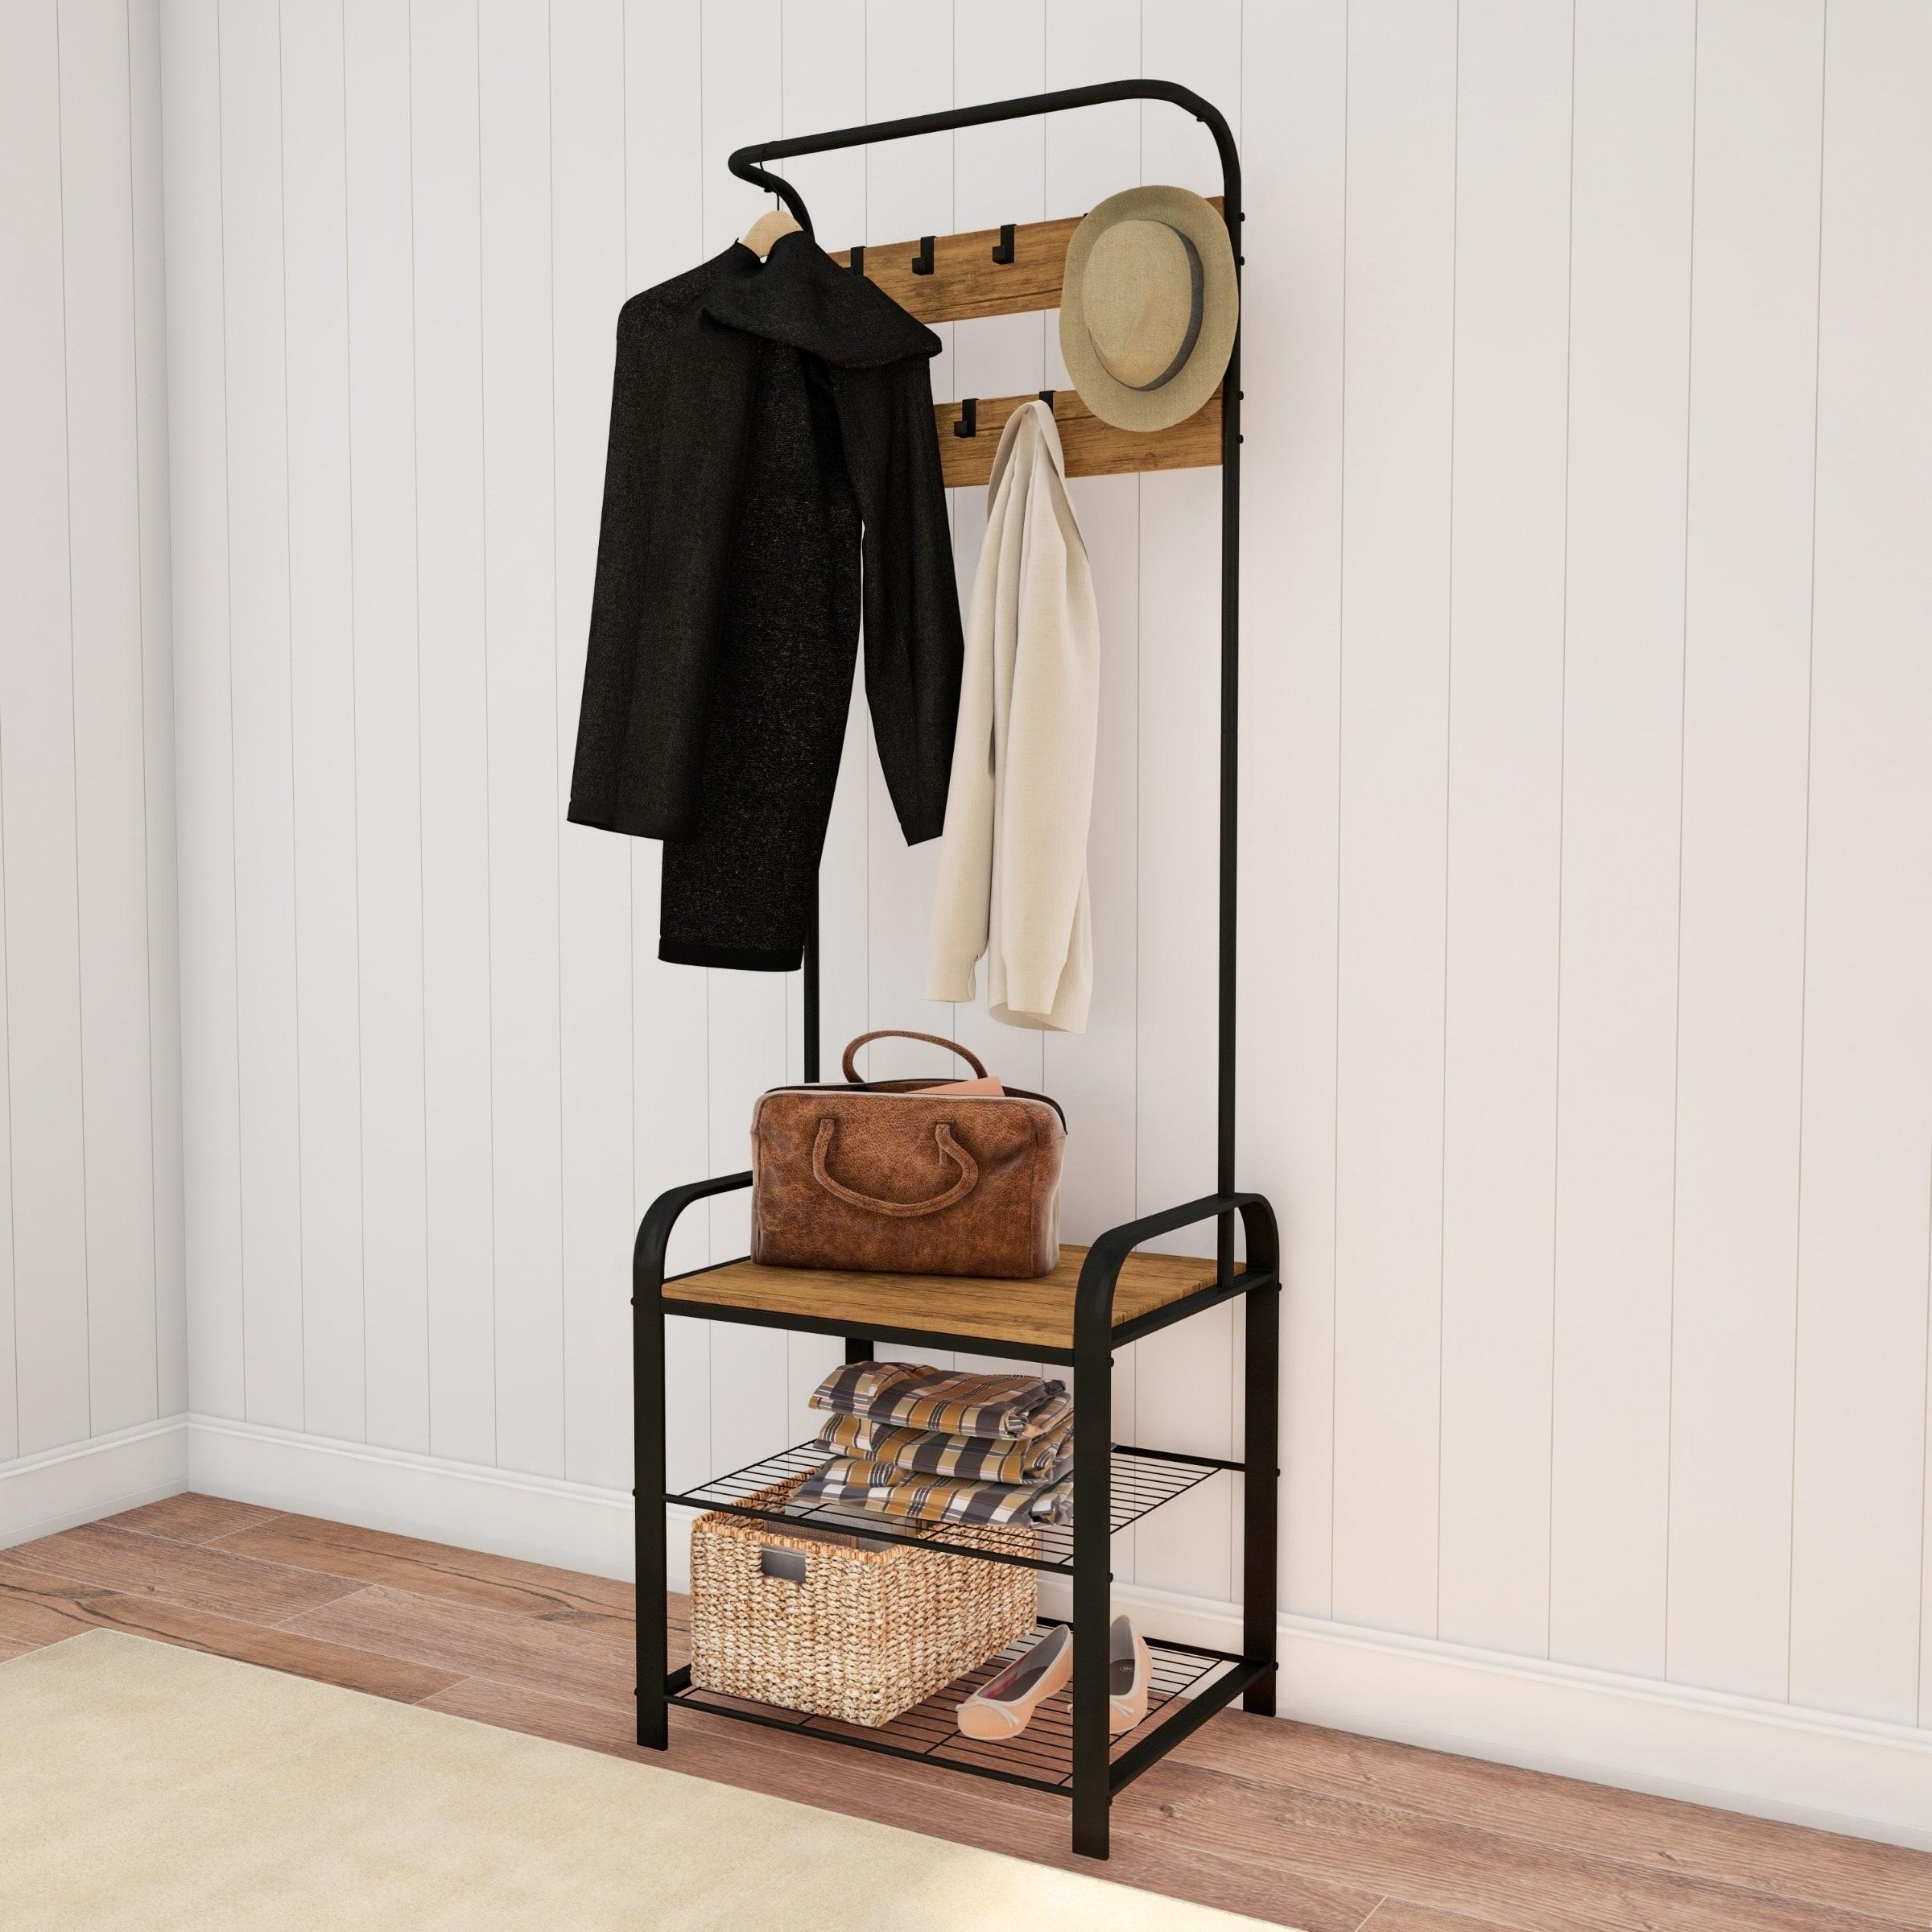 Entryway Coat Rack With Storage Bench